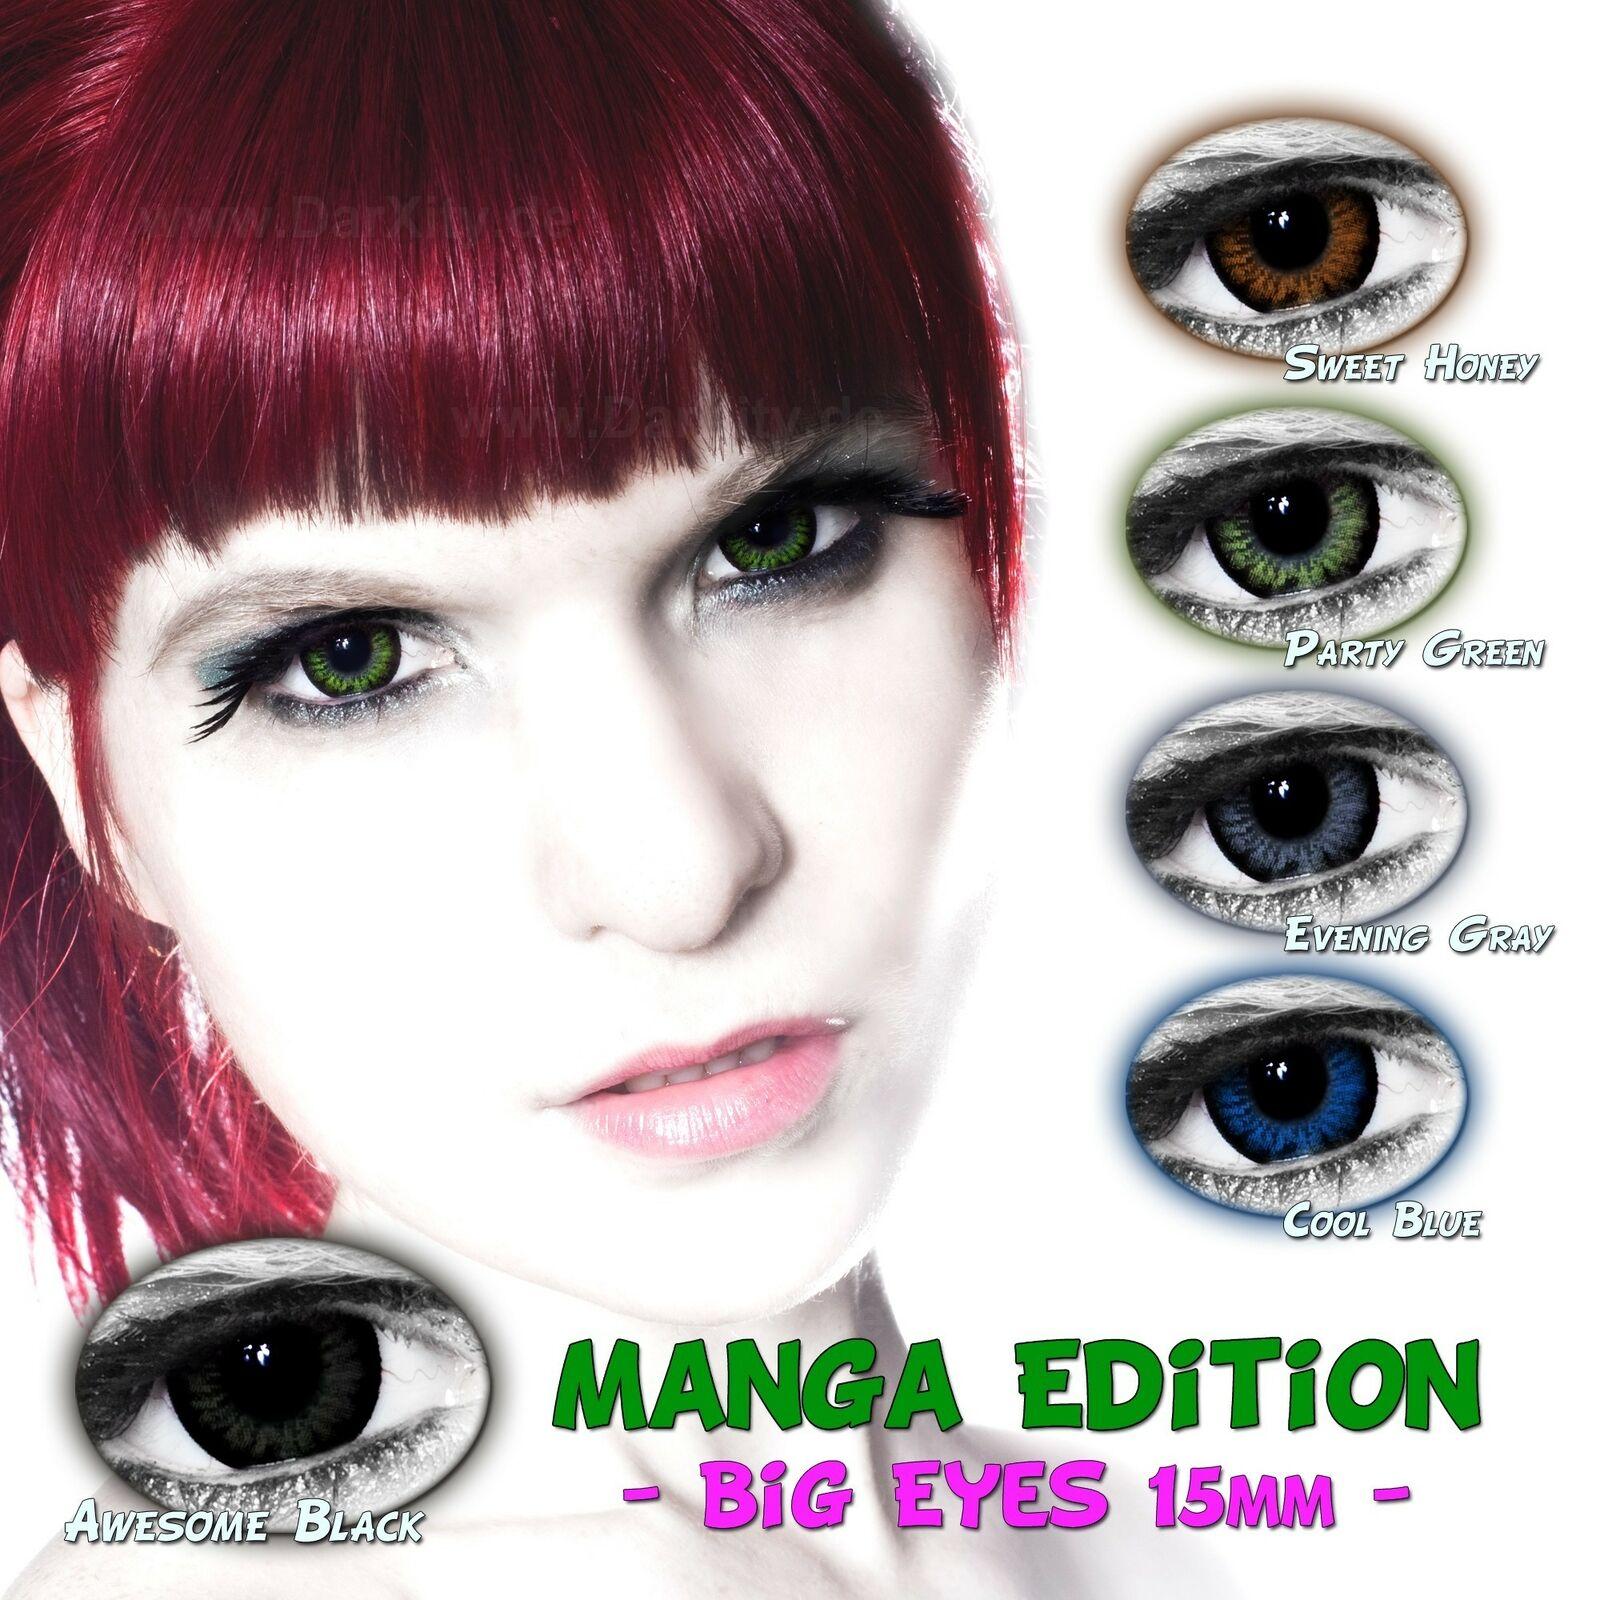 BIG EYES 15mm Manga Edition farbige Kontaktlinsen MIT & OHNE STÄRKE 3 Monats